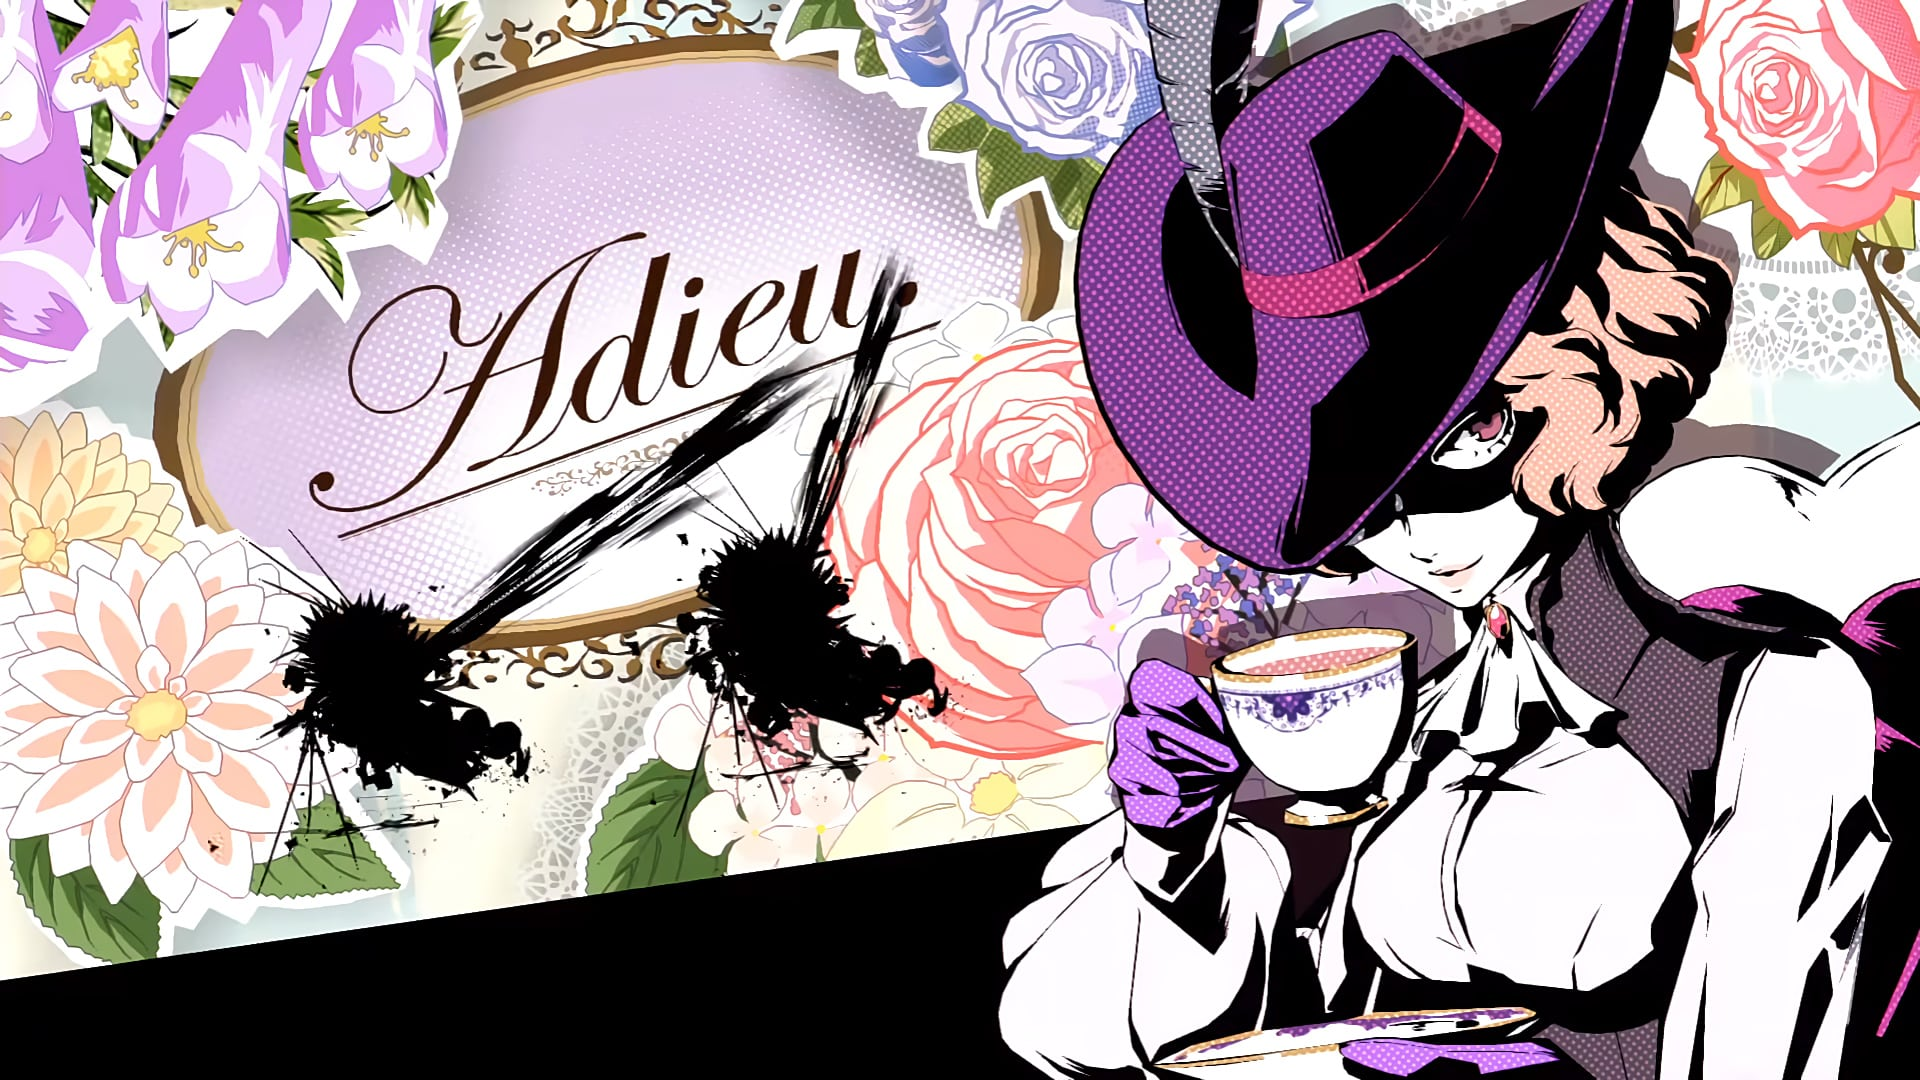 Persona-5-all-out-Haru-Wallpaper